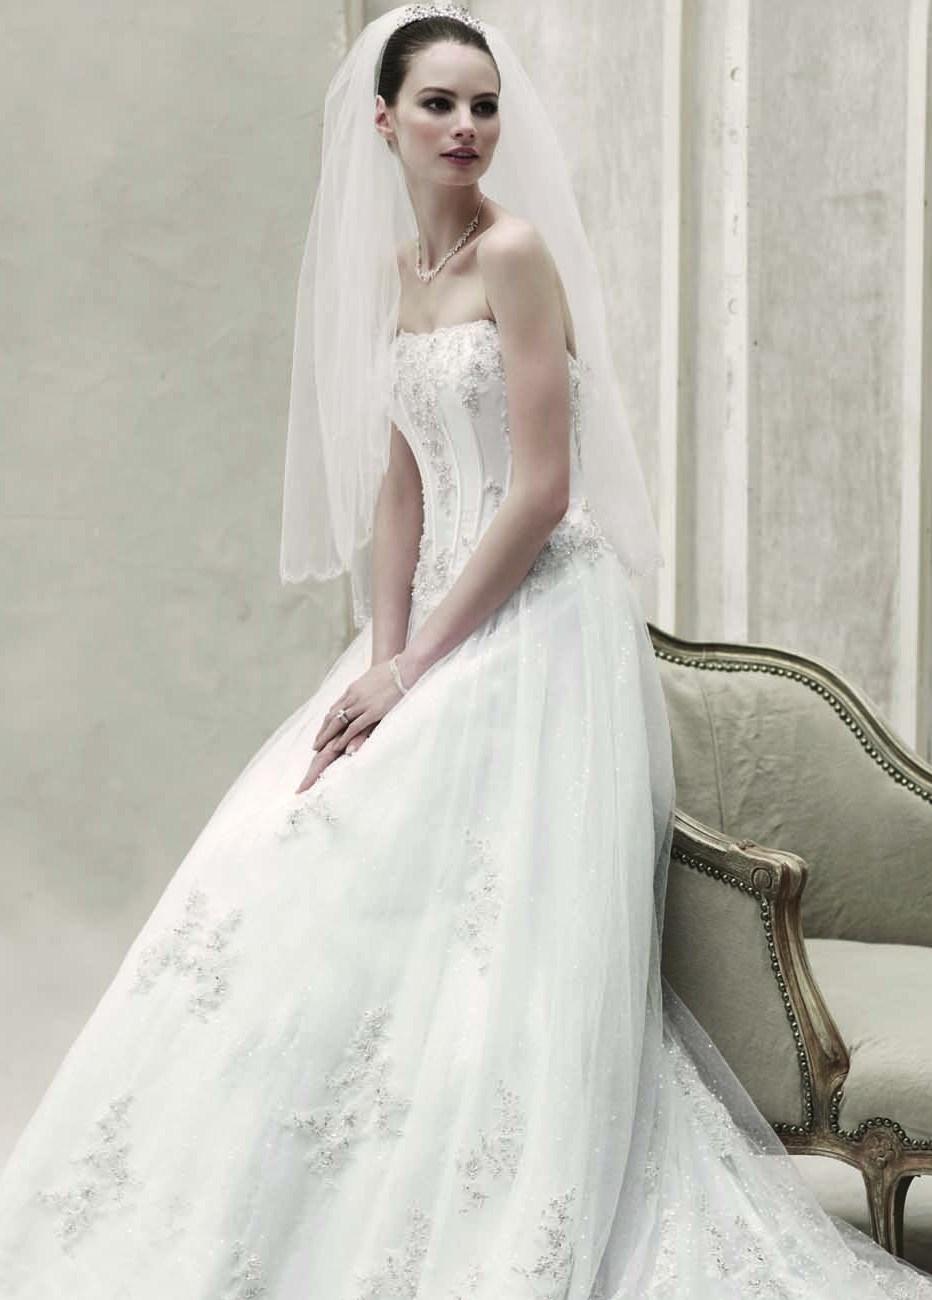 Oleg Cassini 2013 Spring Bridal Collection - World of Bridal